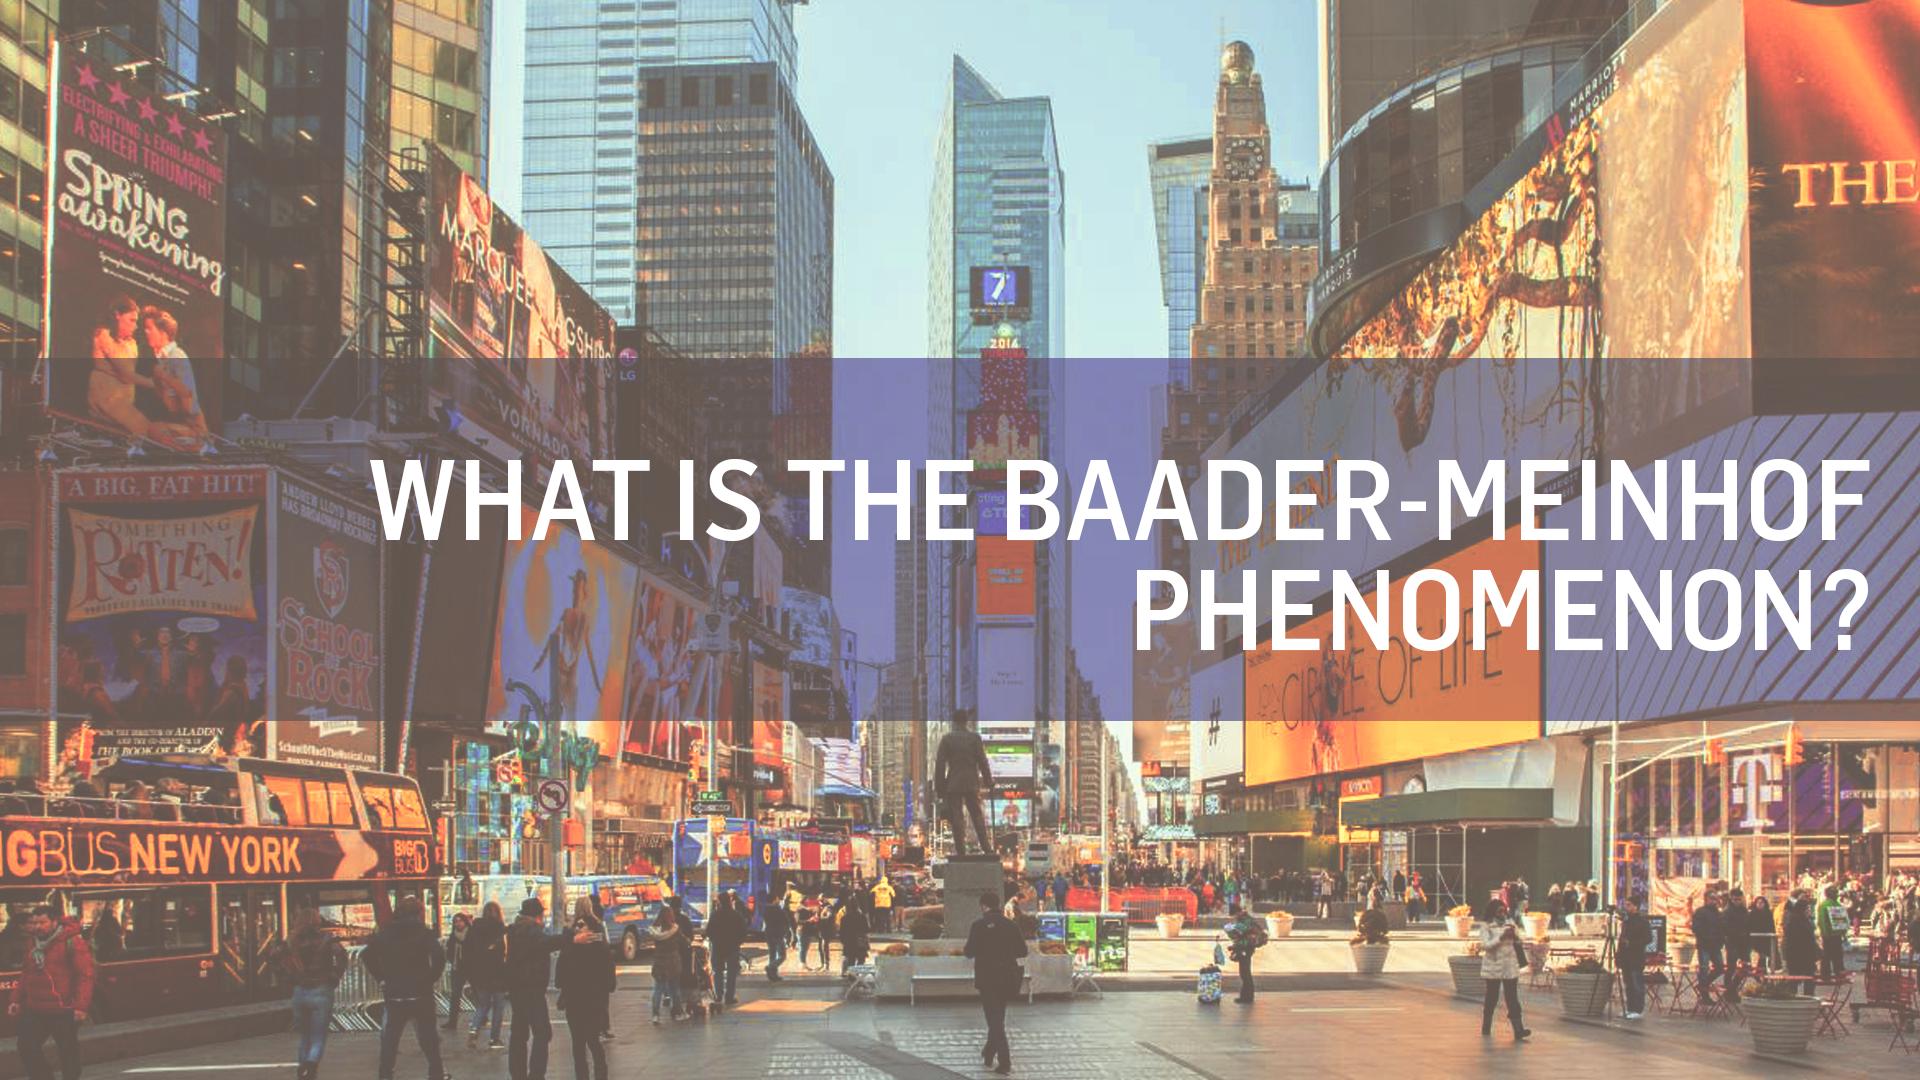 Retargeting Ads and the Baader-Meinhof Phenomenon